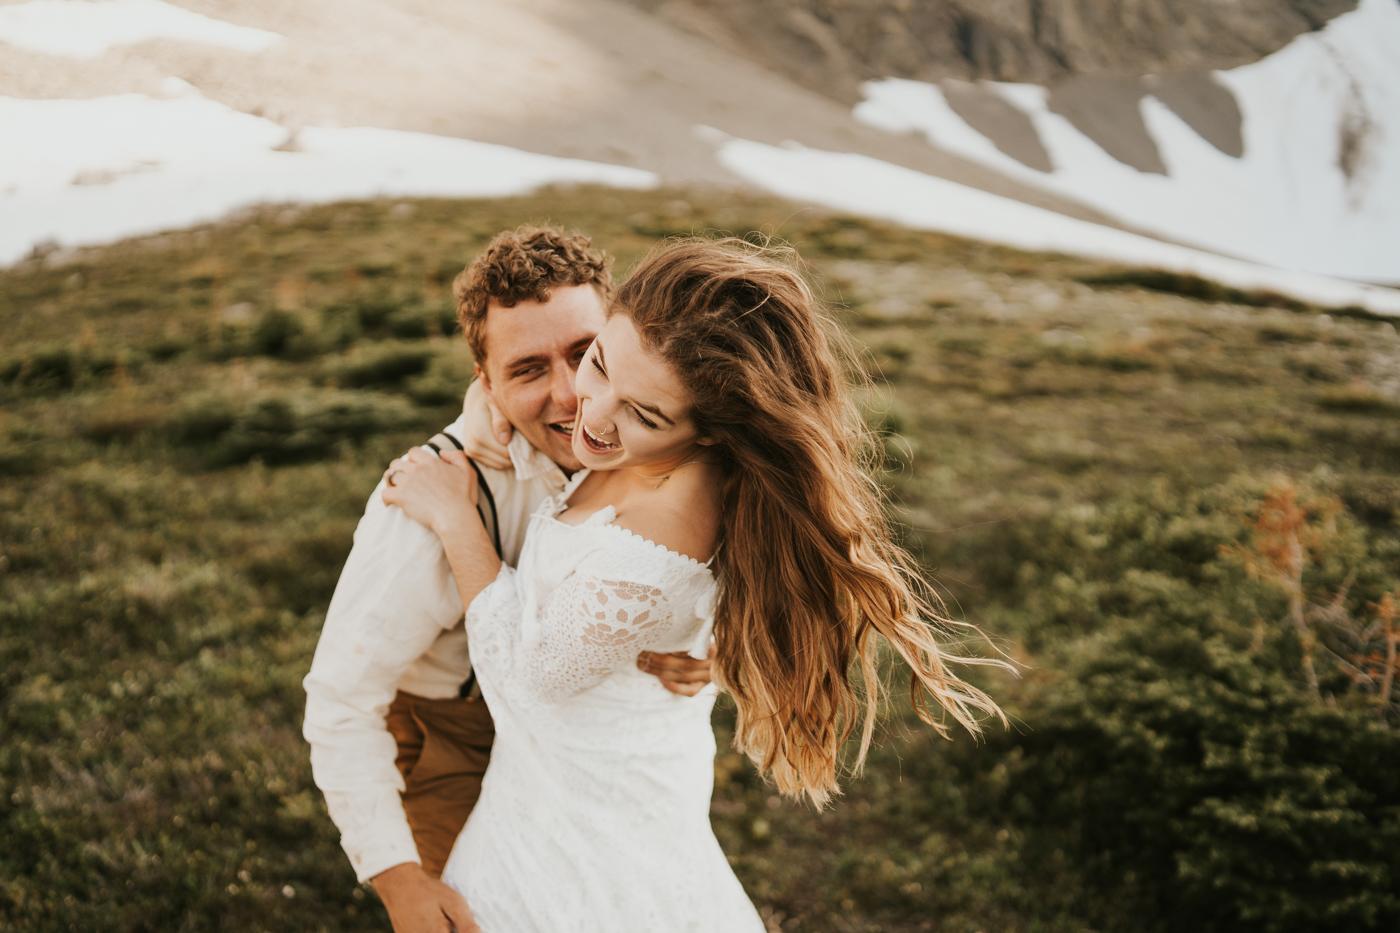 tyraephotography_photographer_wedding_elopement_engagement_photography-08066.jpg